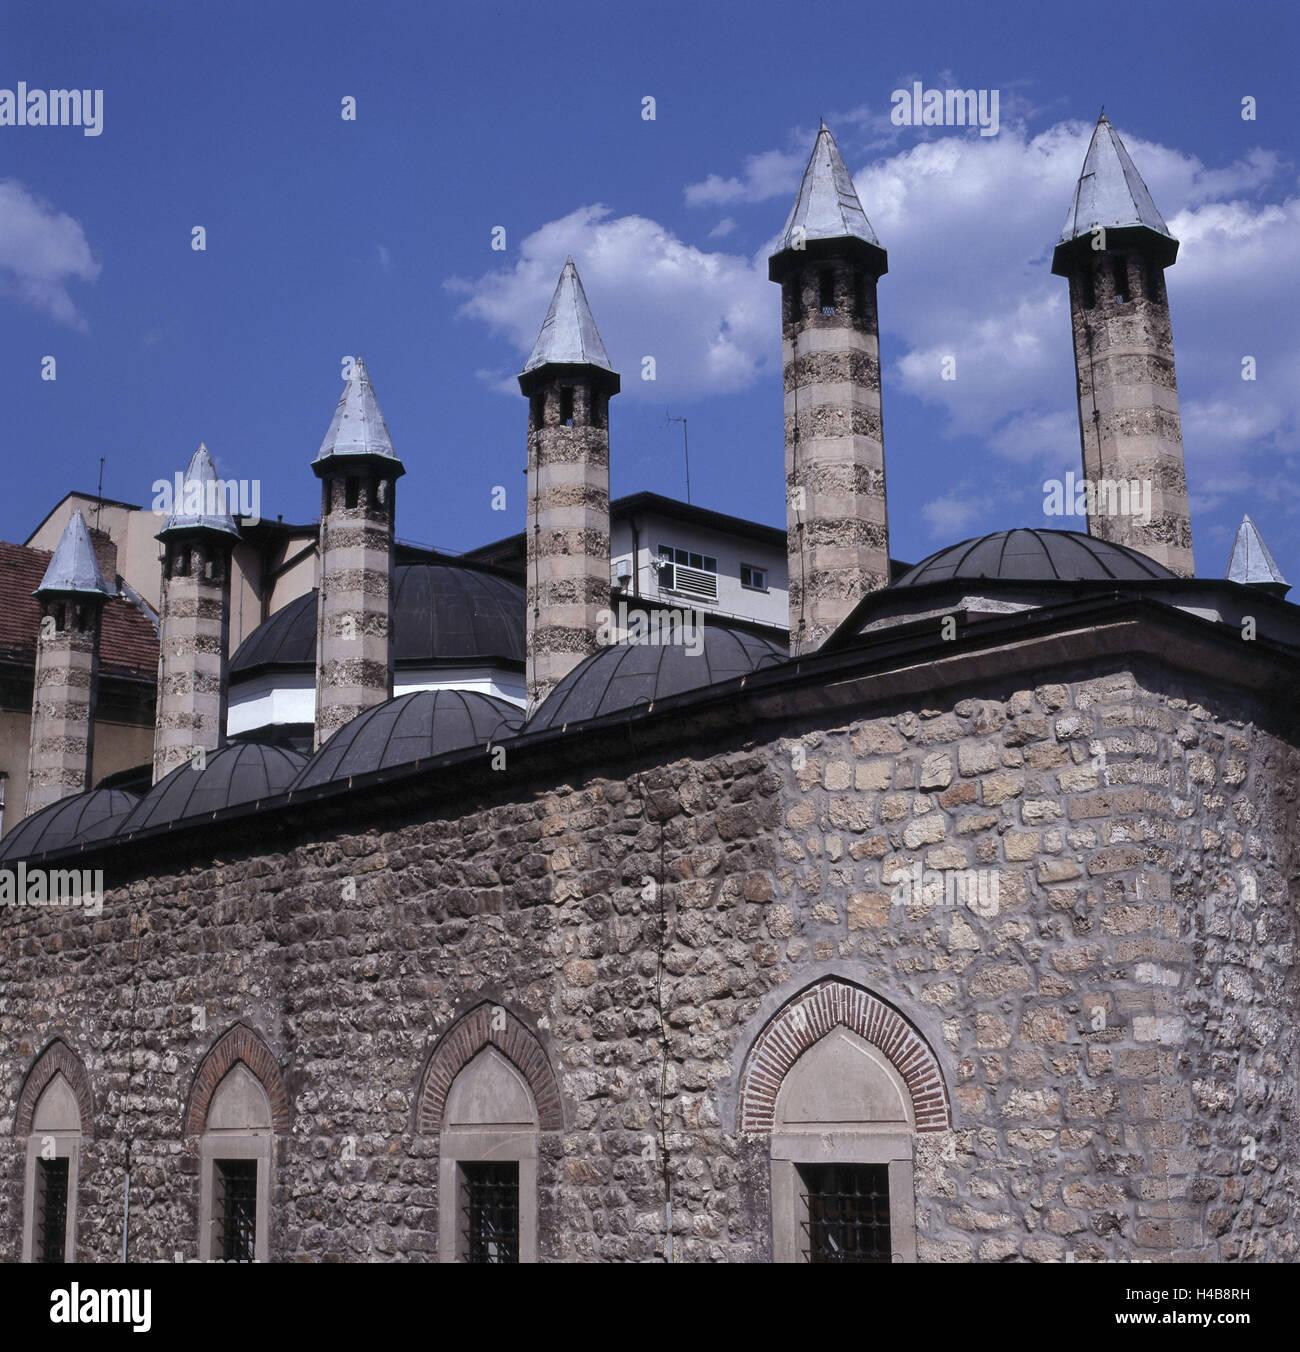 Bosnia-Herzegovina, Sarajevo, Medresa, religious school in the Gazi Husrev-beg Mosque, - Stock Image